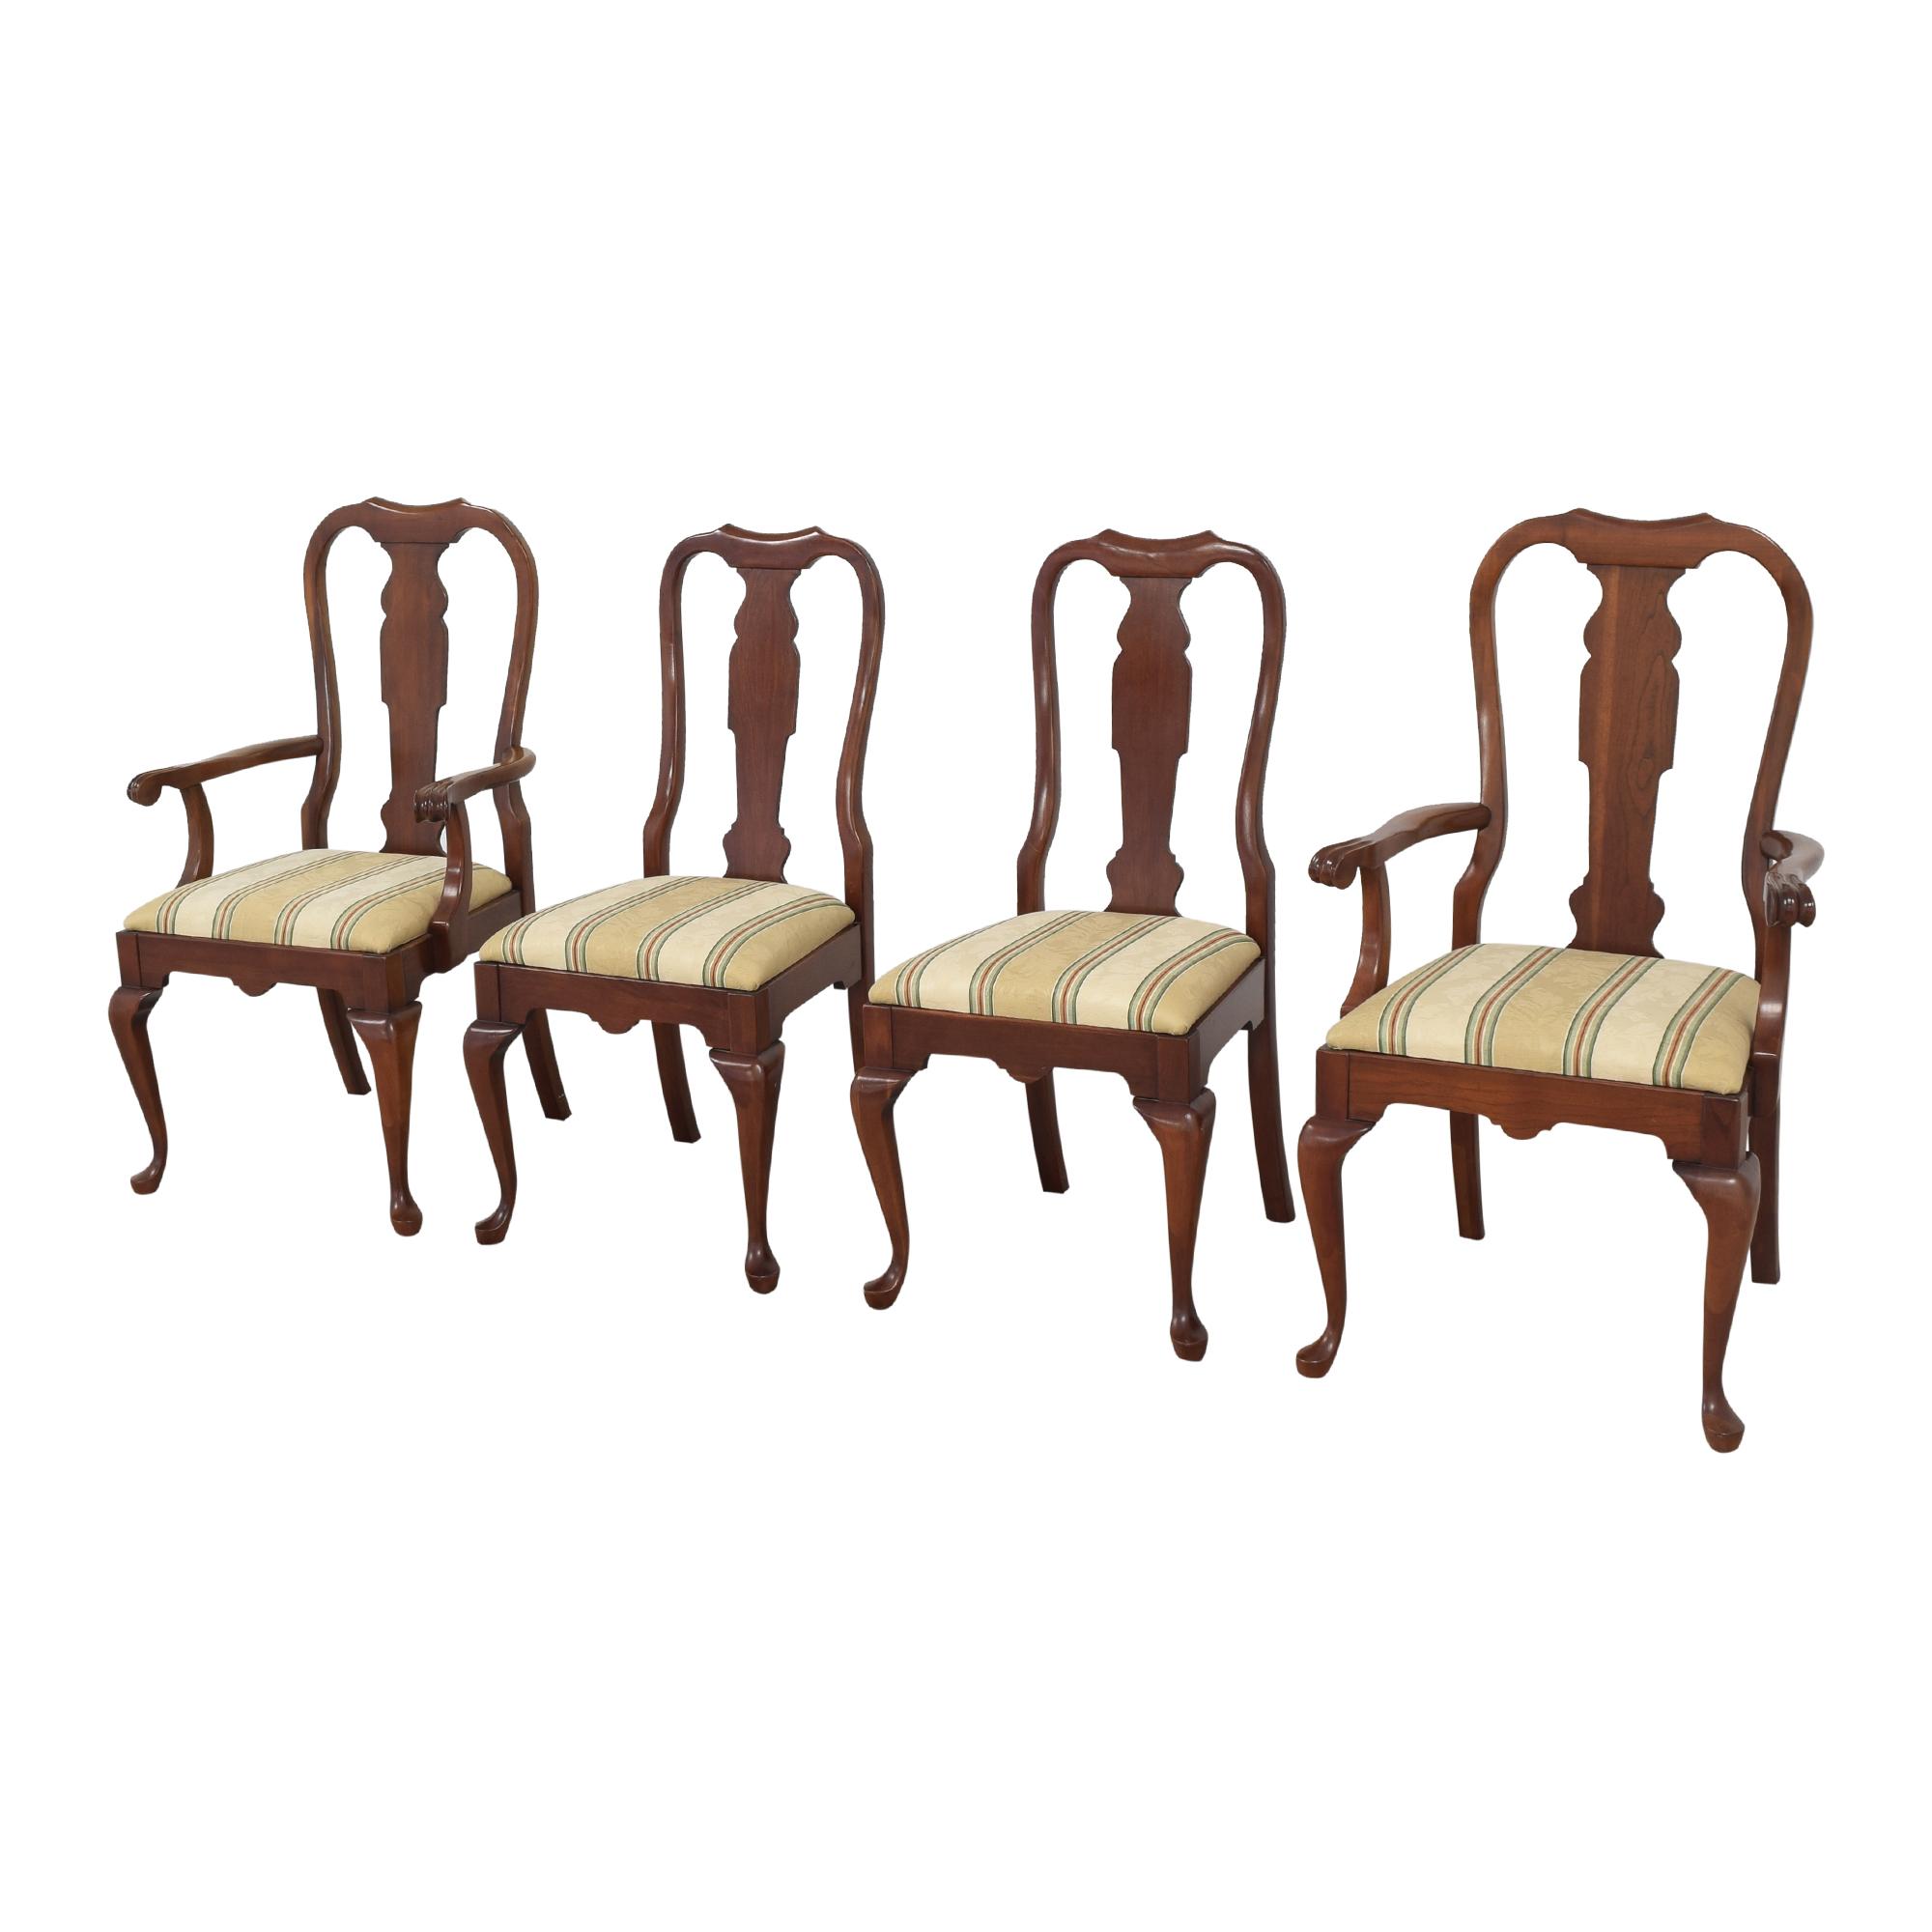 Pennsylvania House Pennsylvania House Stripe Dining Chairs second hand